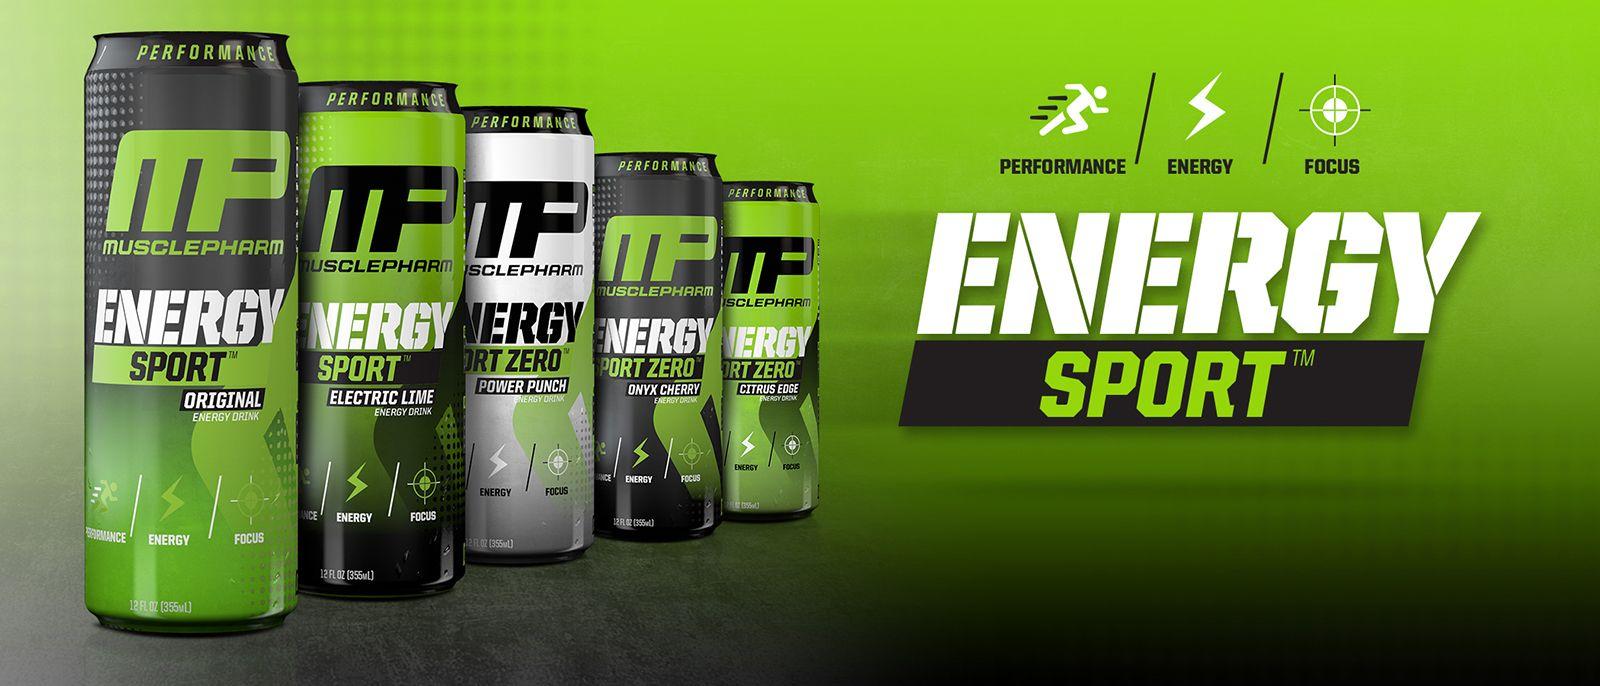 energy sport drink